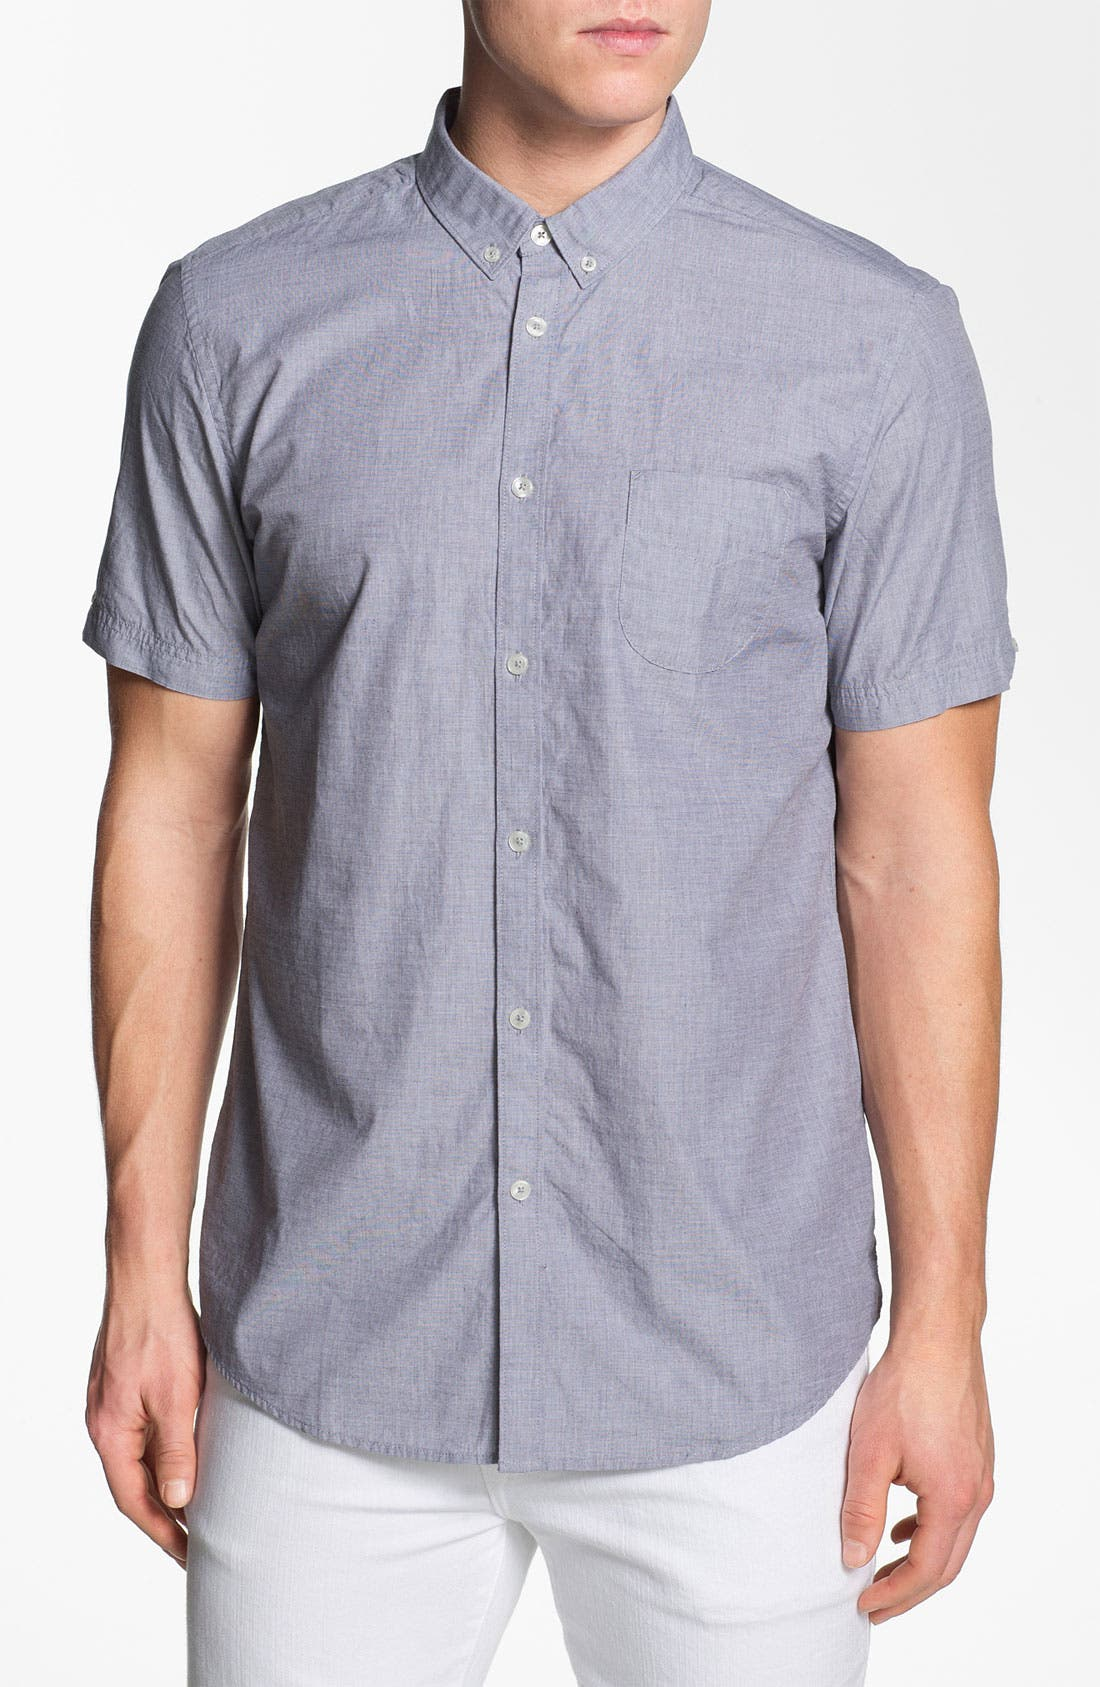 Main Image - Ben Sherman End on End Woven Shirt